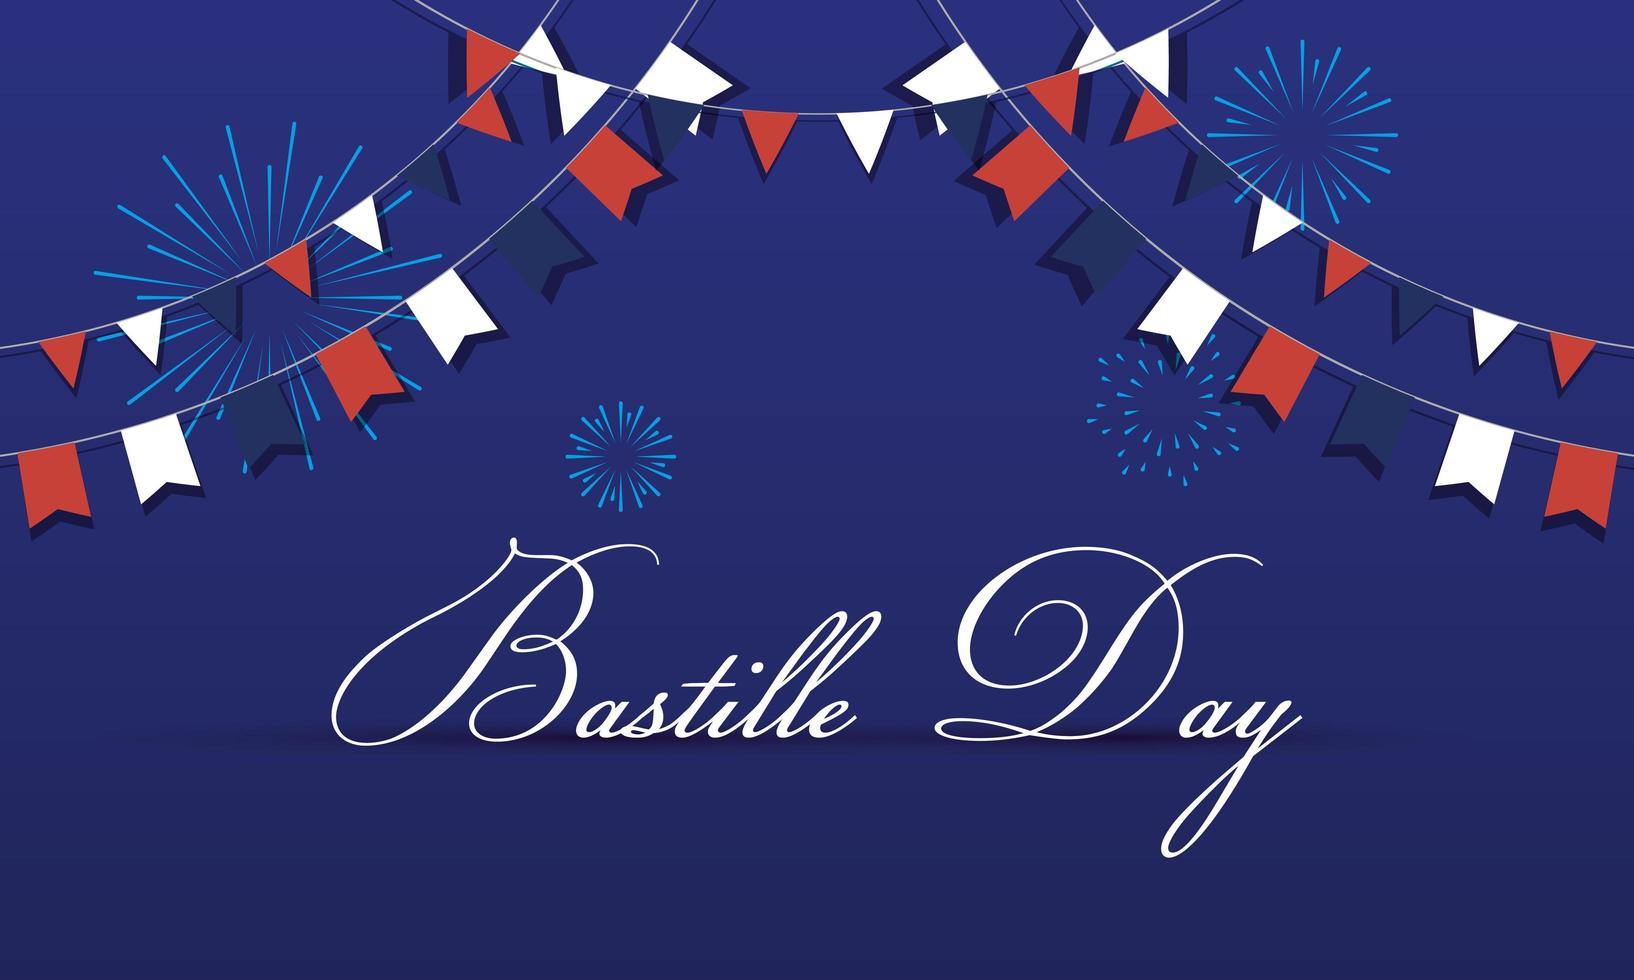 bastille dag firande banner med krans vektor